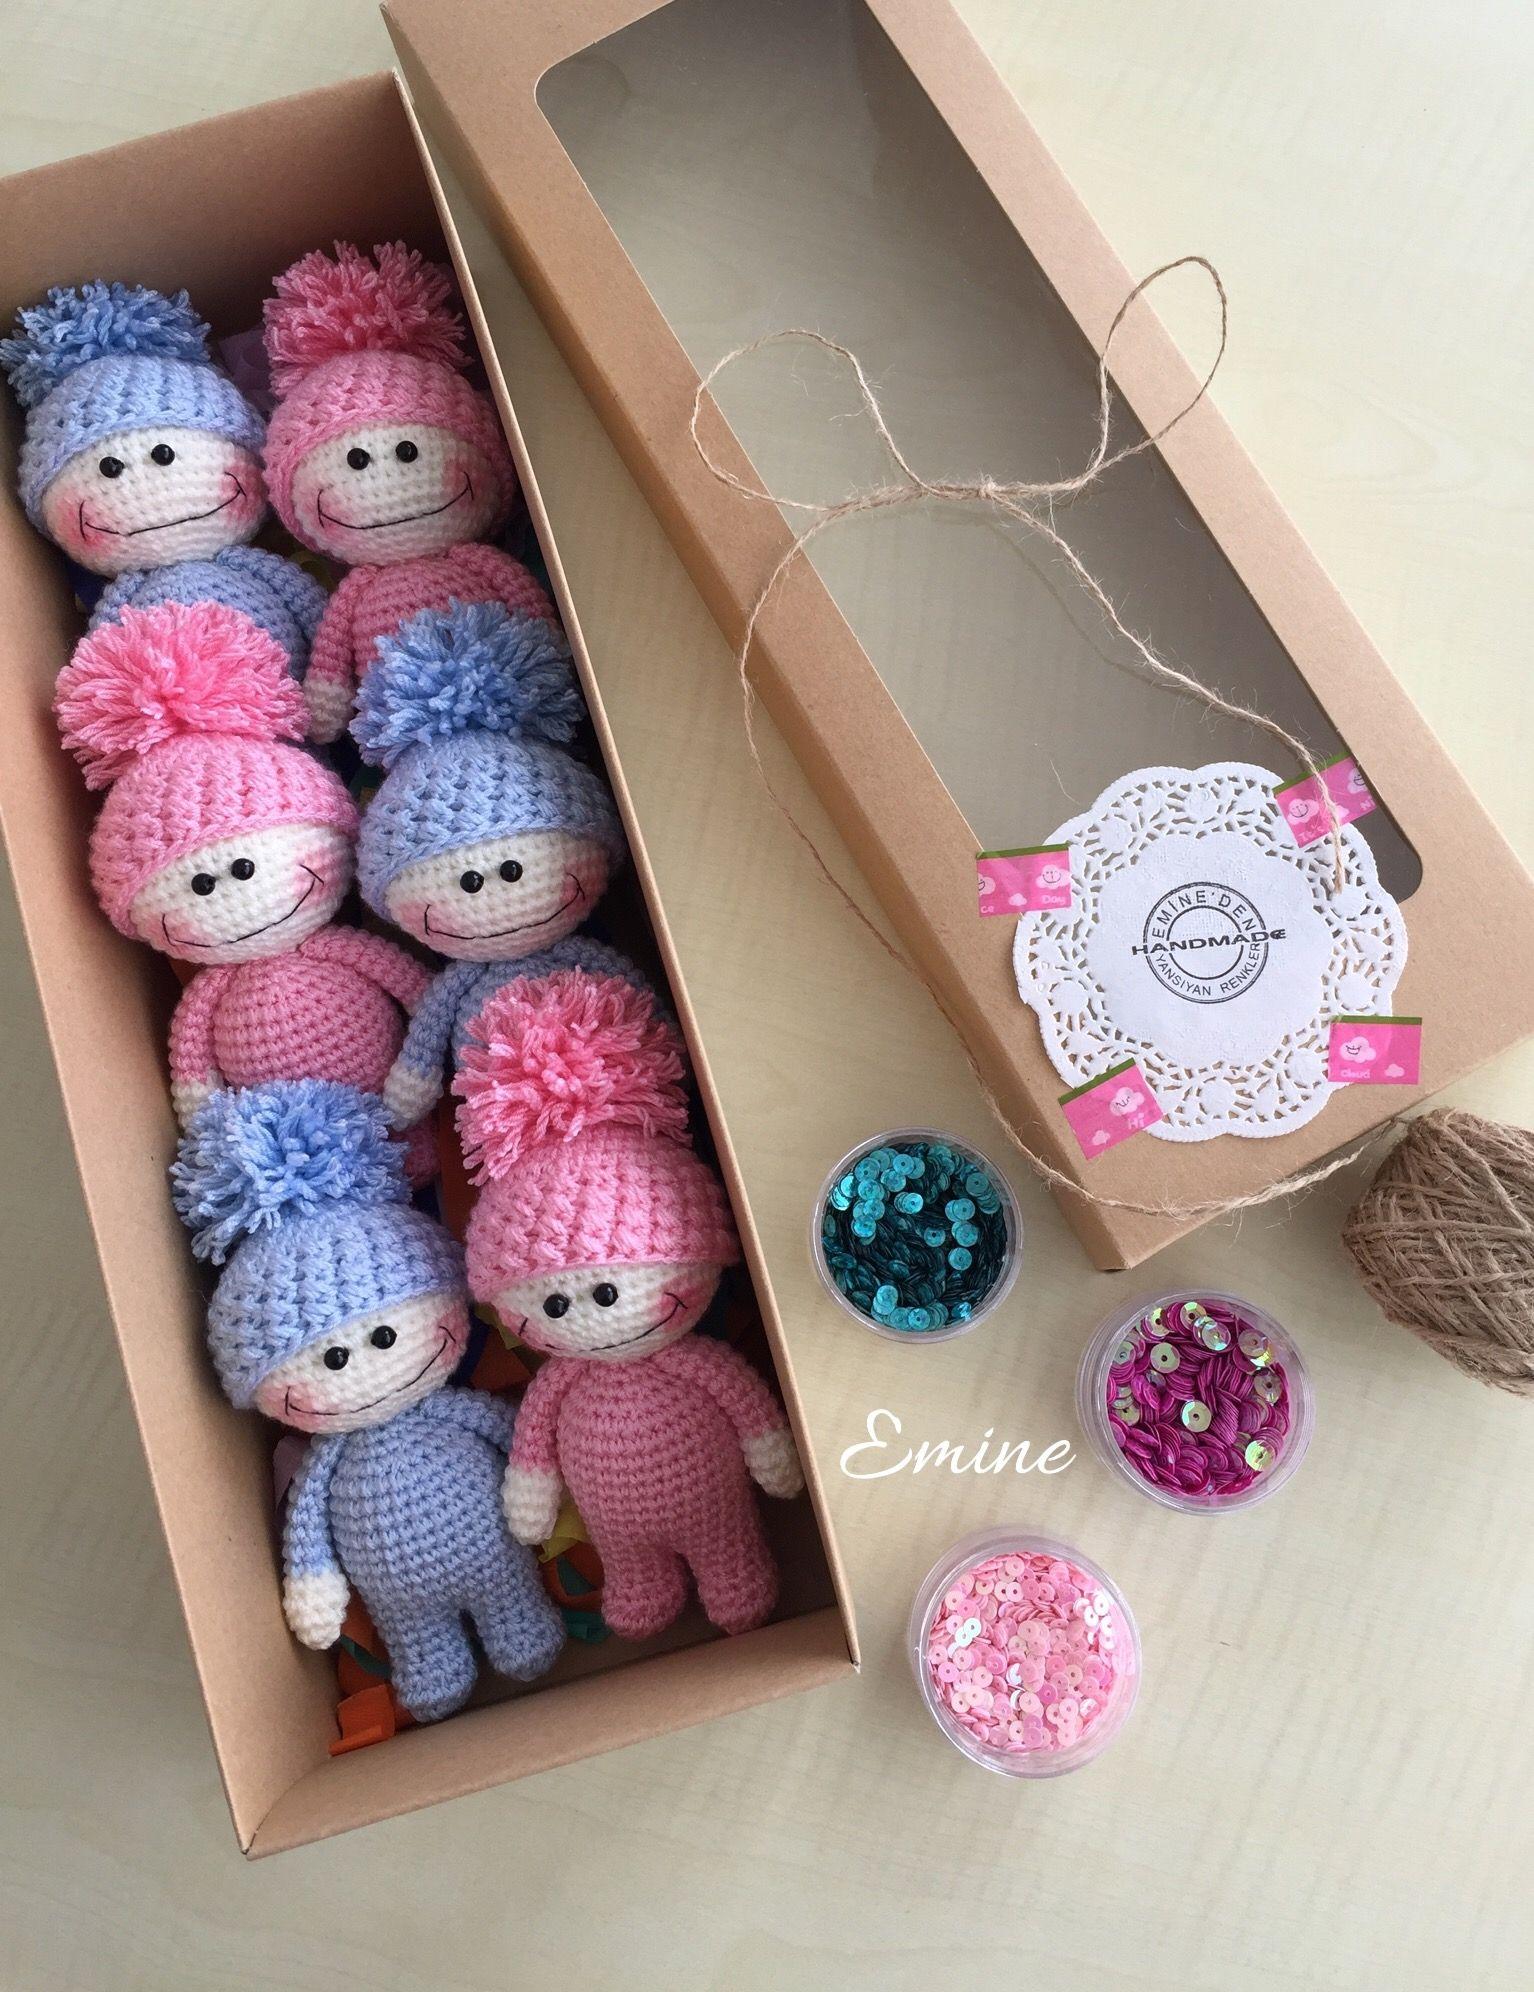 Pin de karina garcia en muñecos crochet | Pinterest | Patrones ...